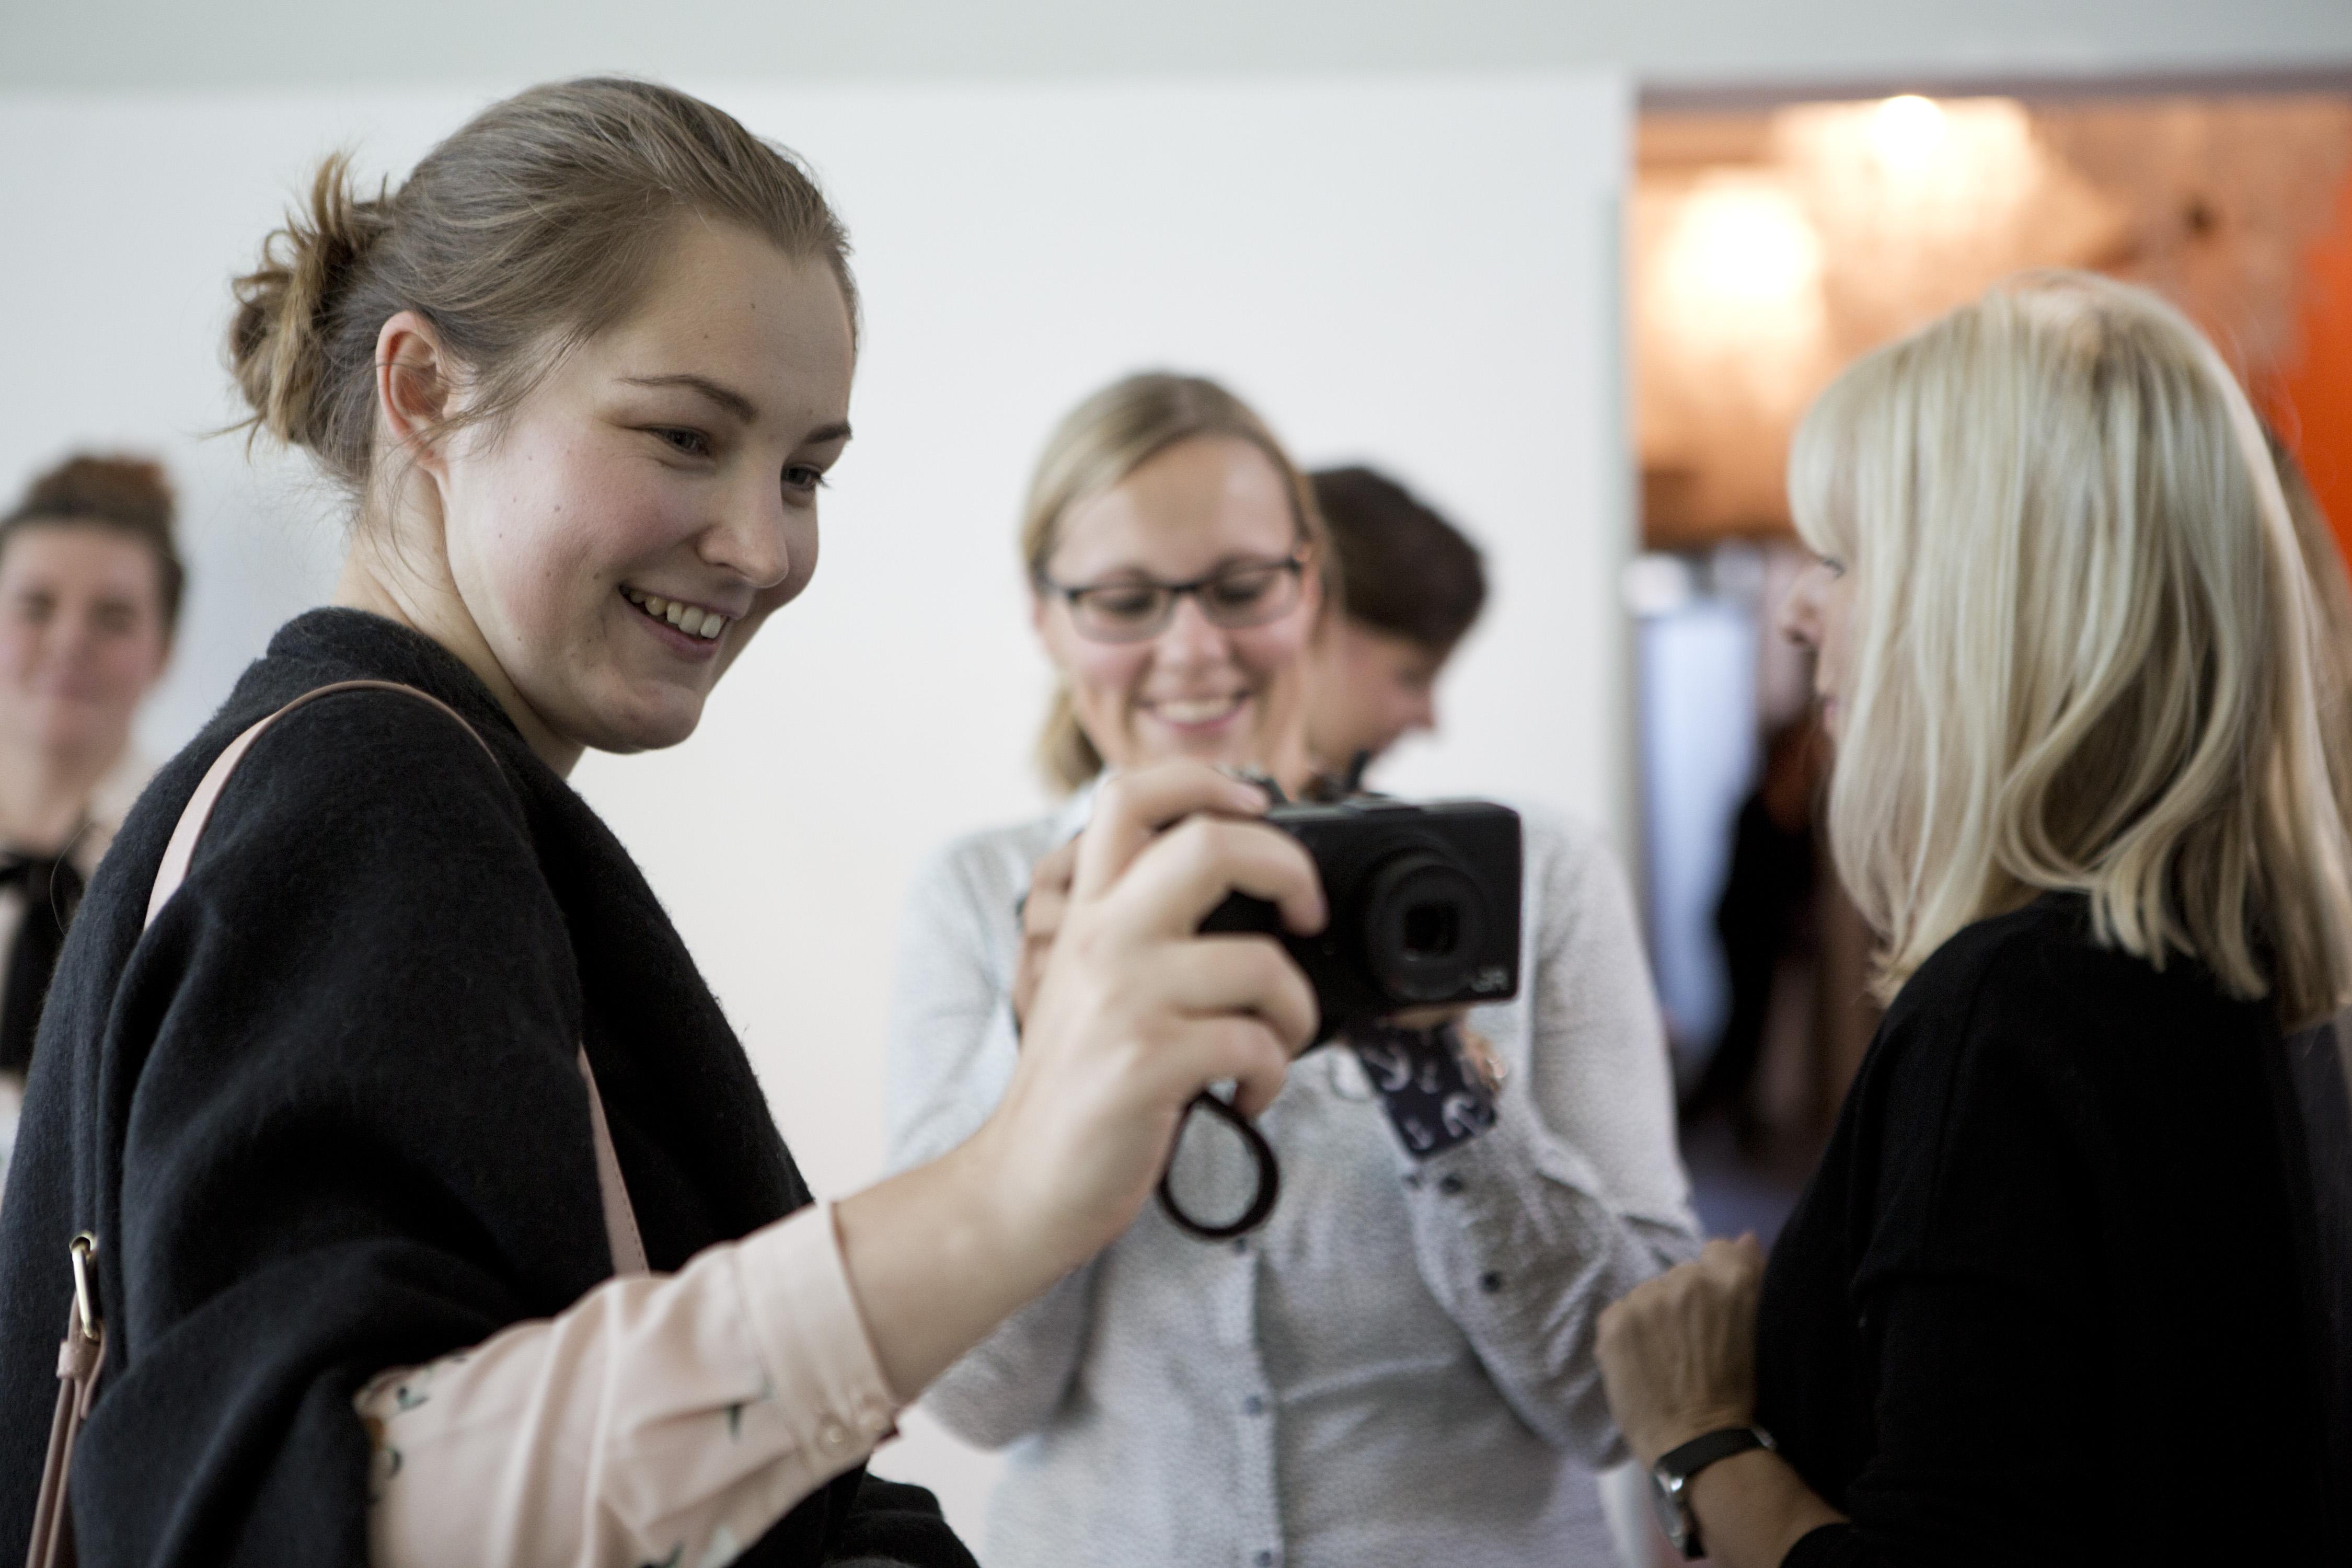 1000 gute gründe - blogger event 0132